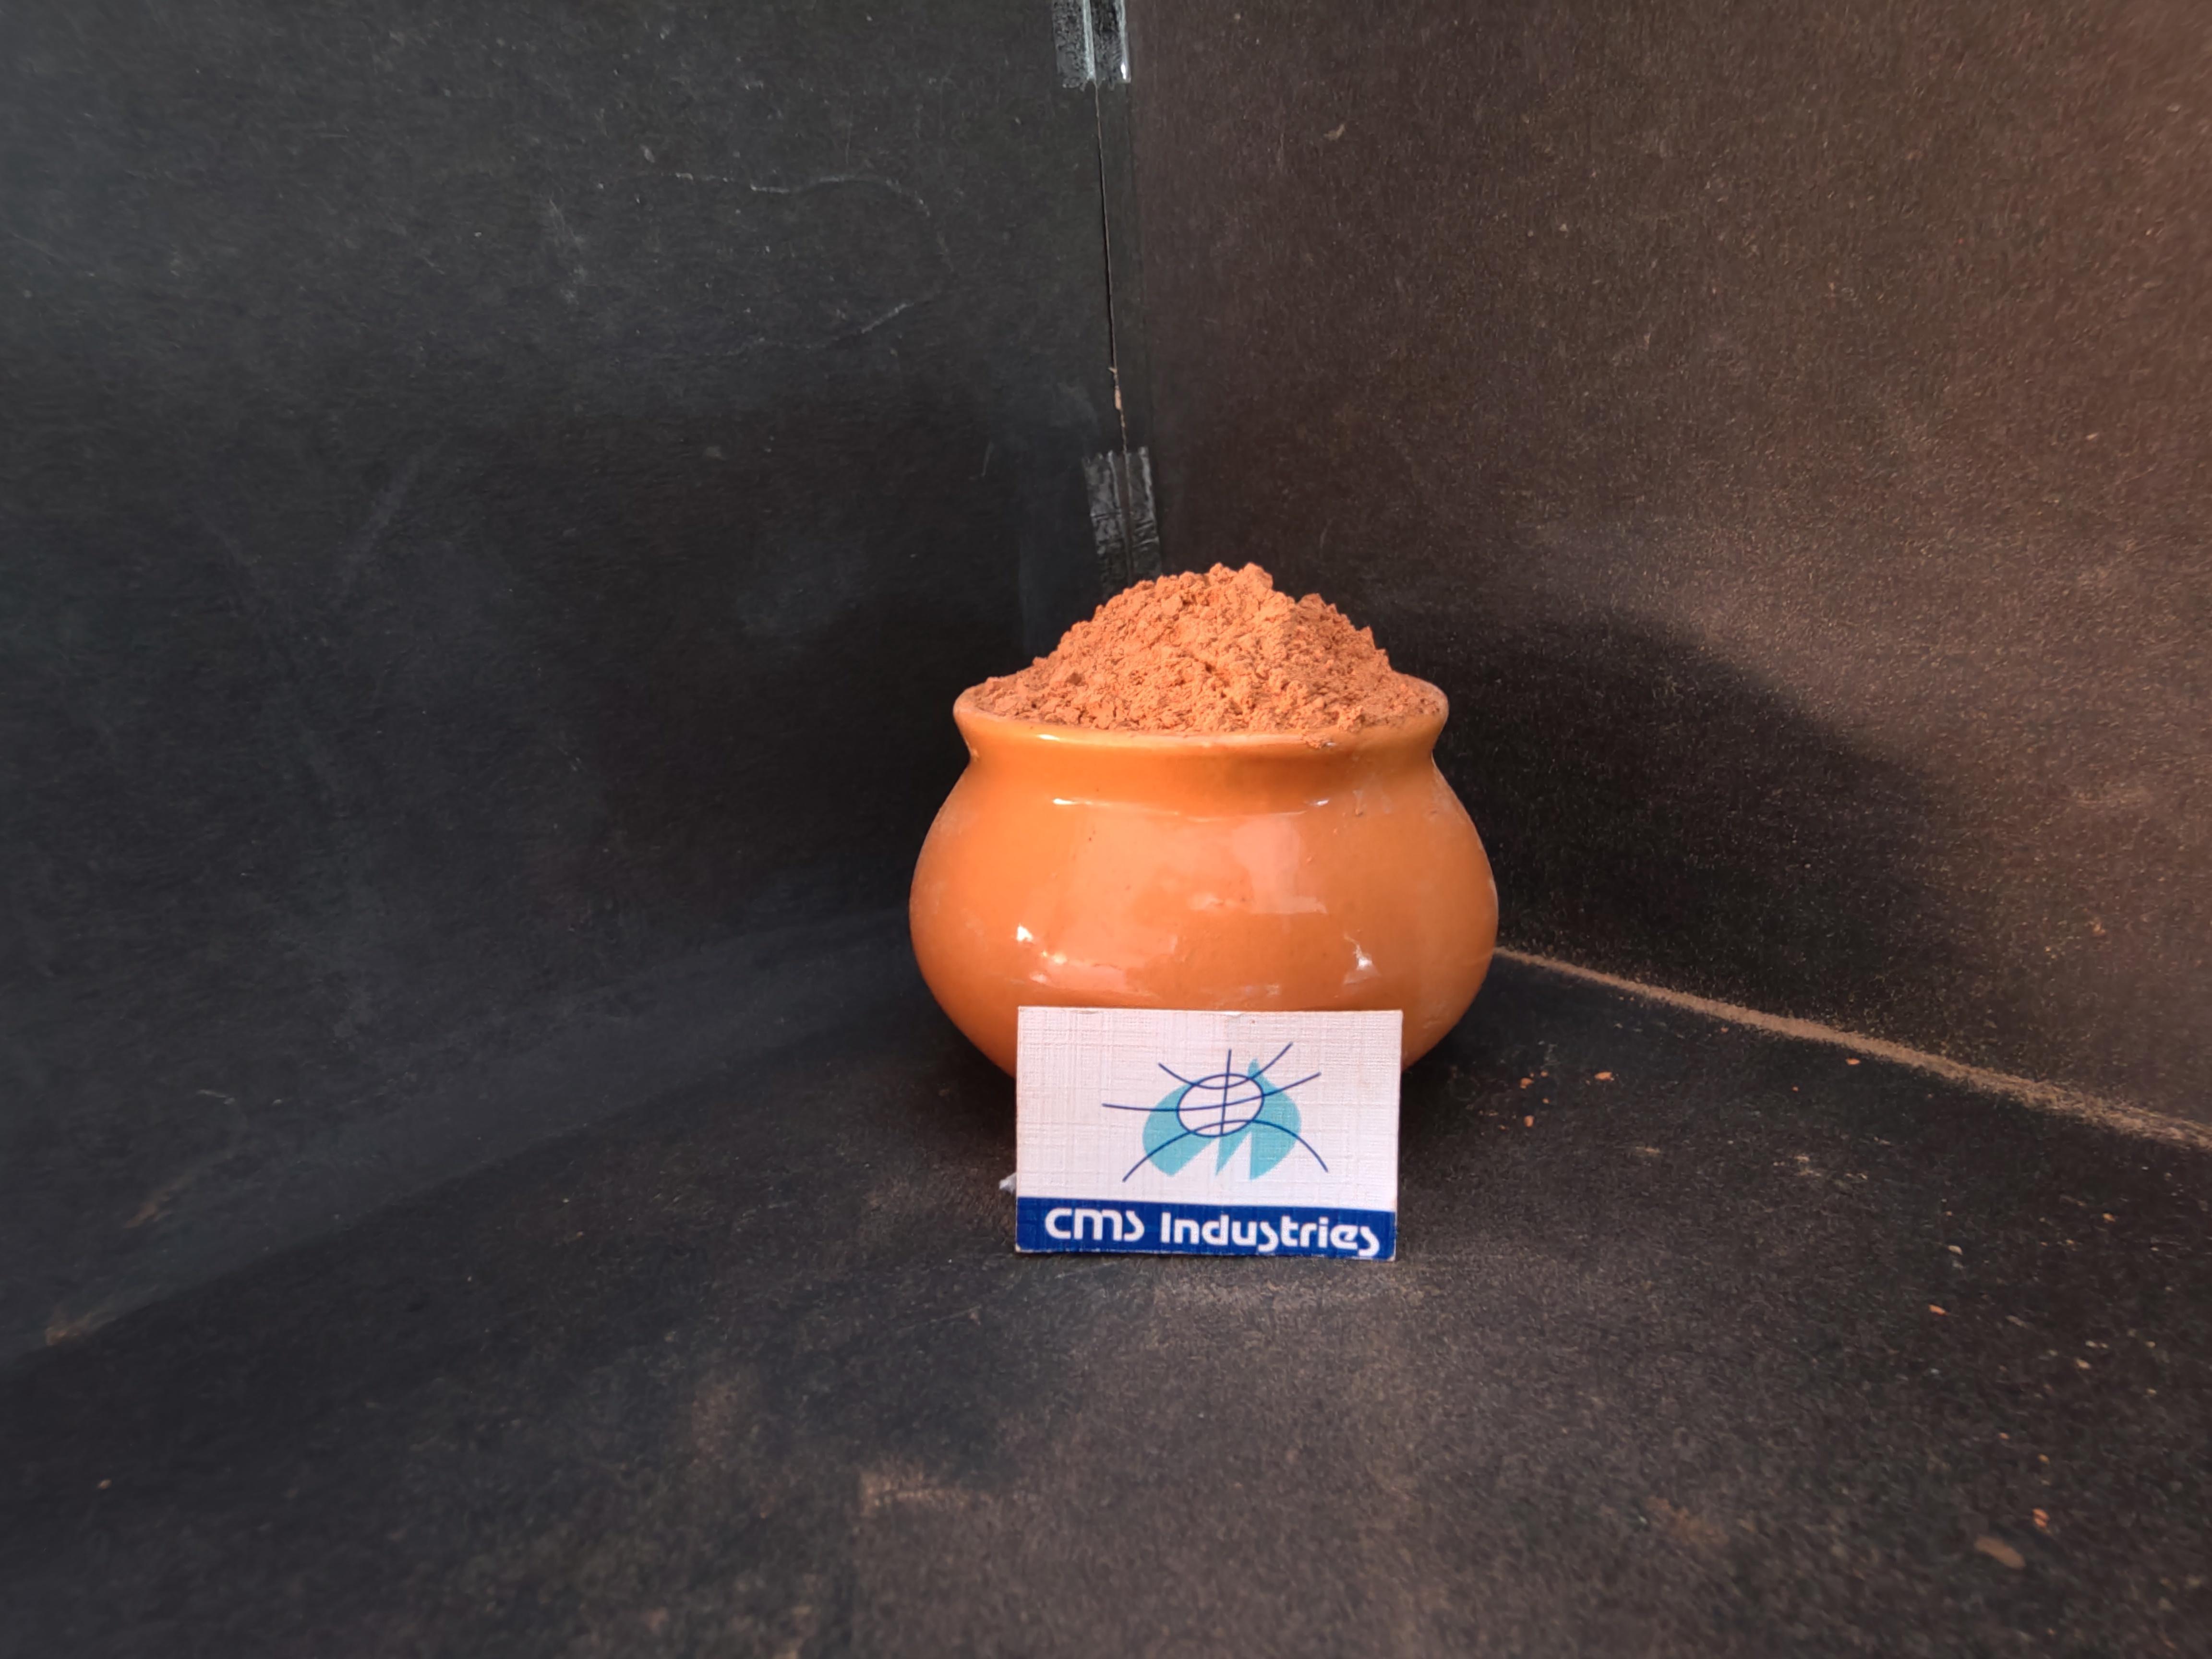 Oil Drilling Grade Bentonite Powder